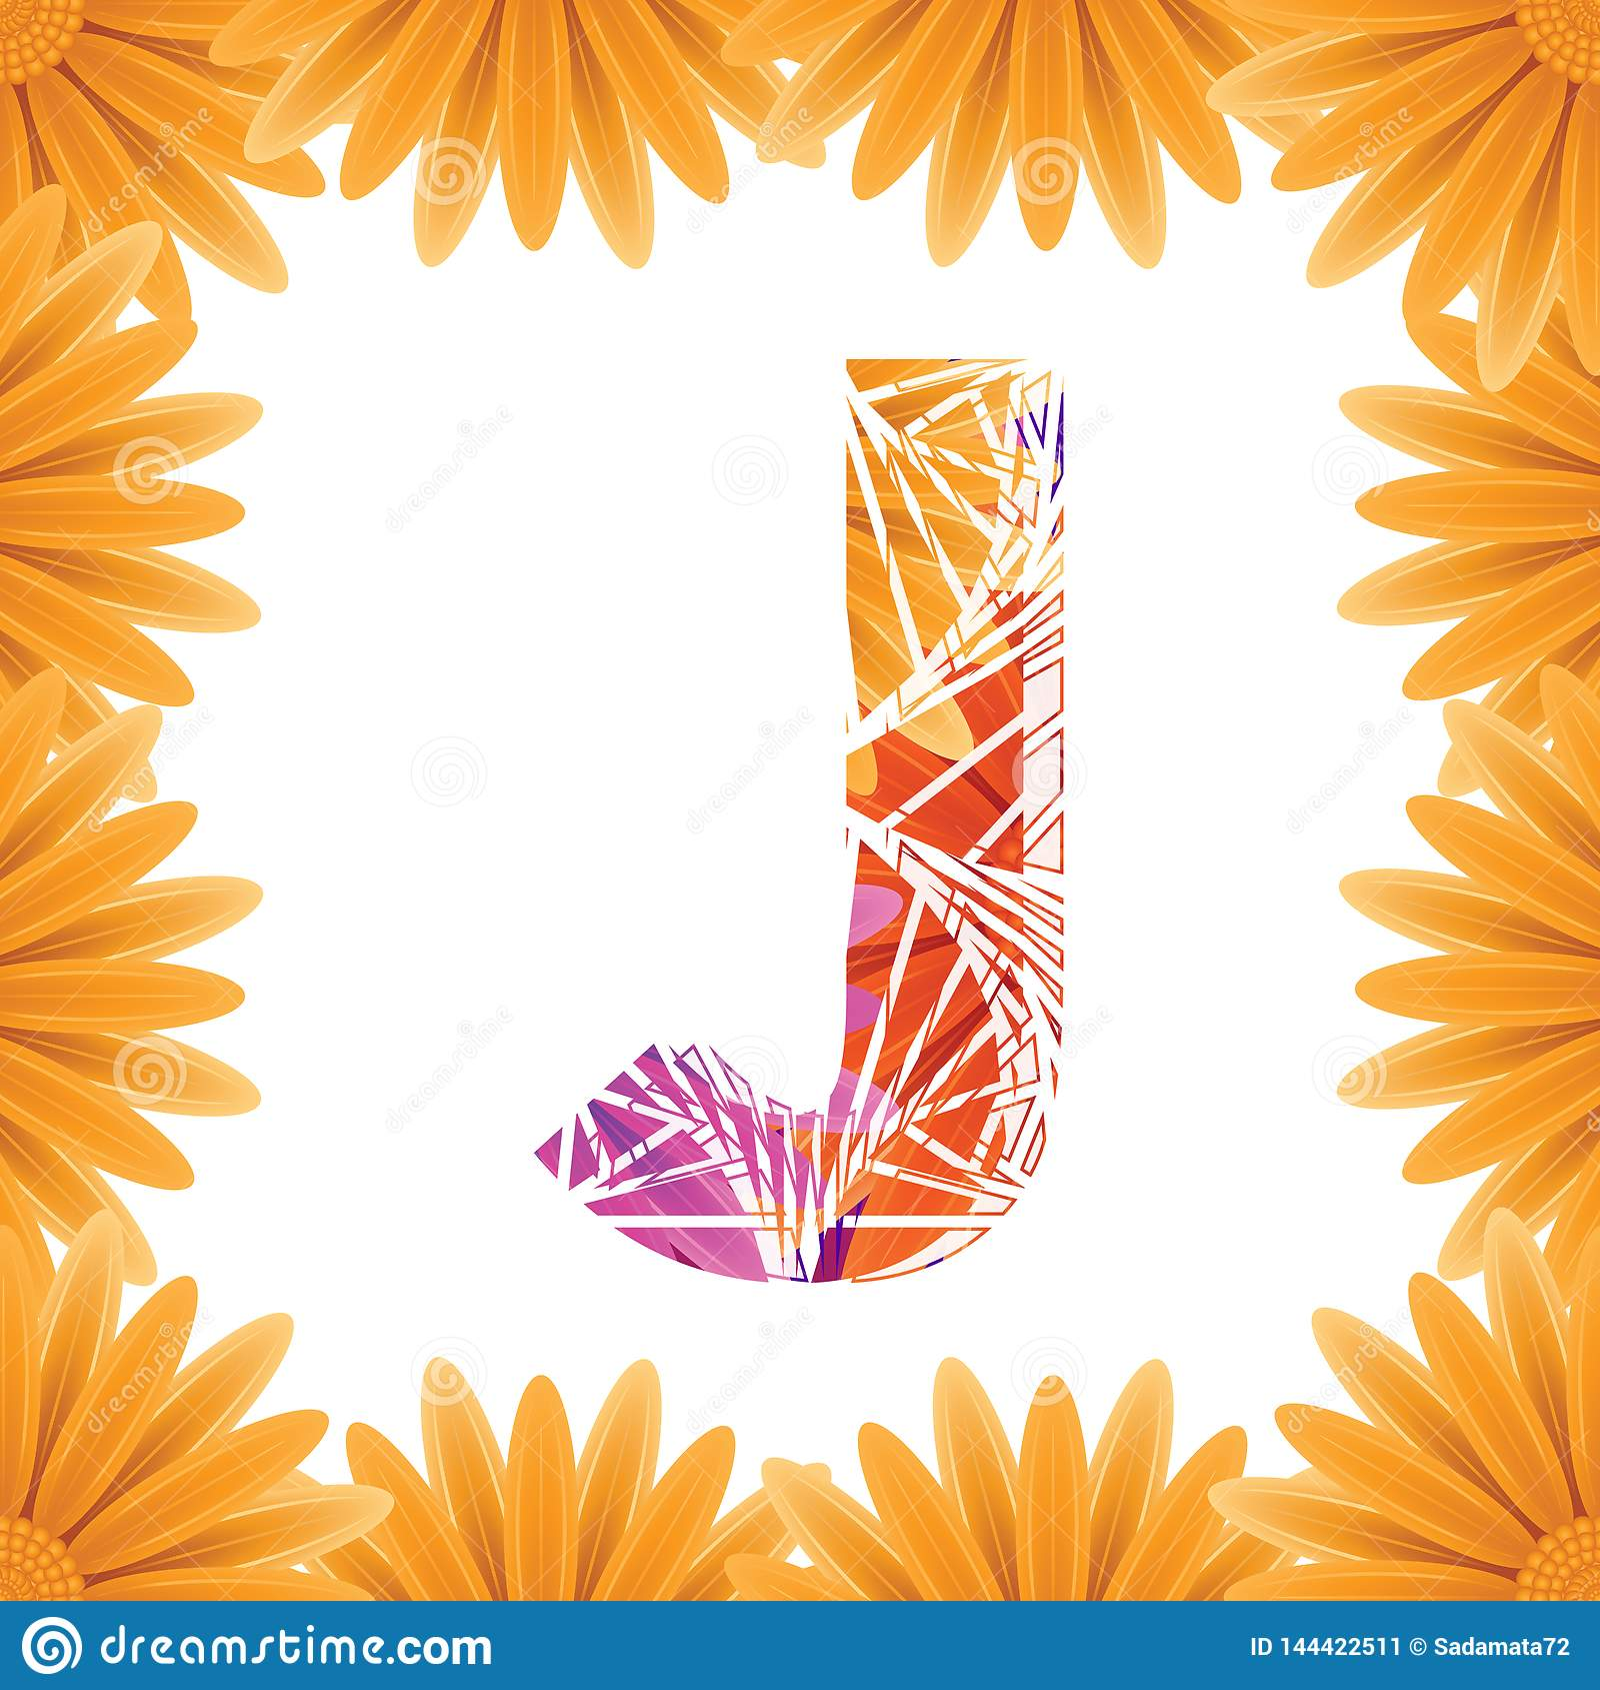 Floral Letter J design template. Mother's Das flower logo type design concept of Abstract alphabet logo